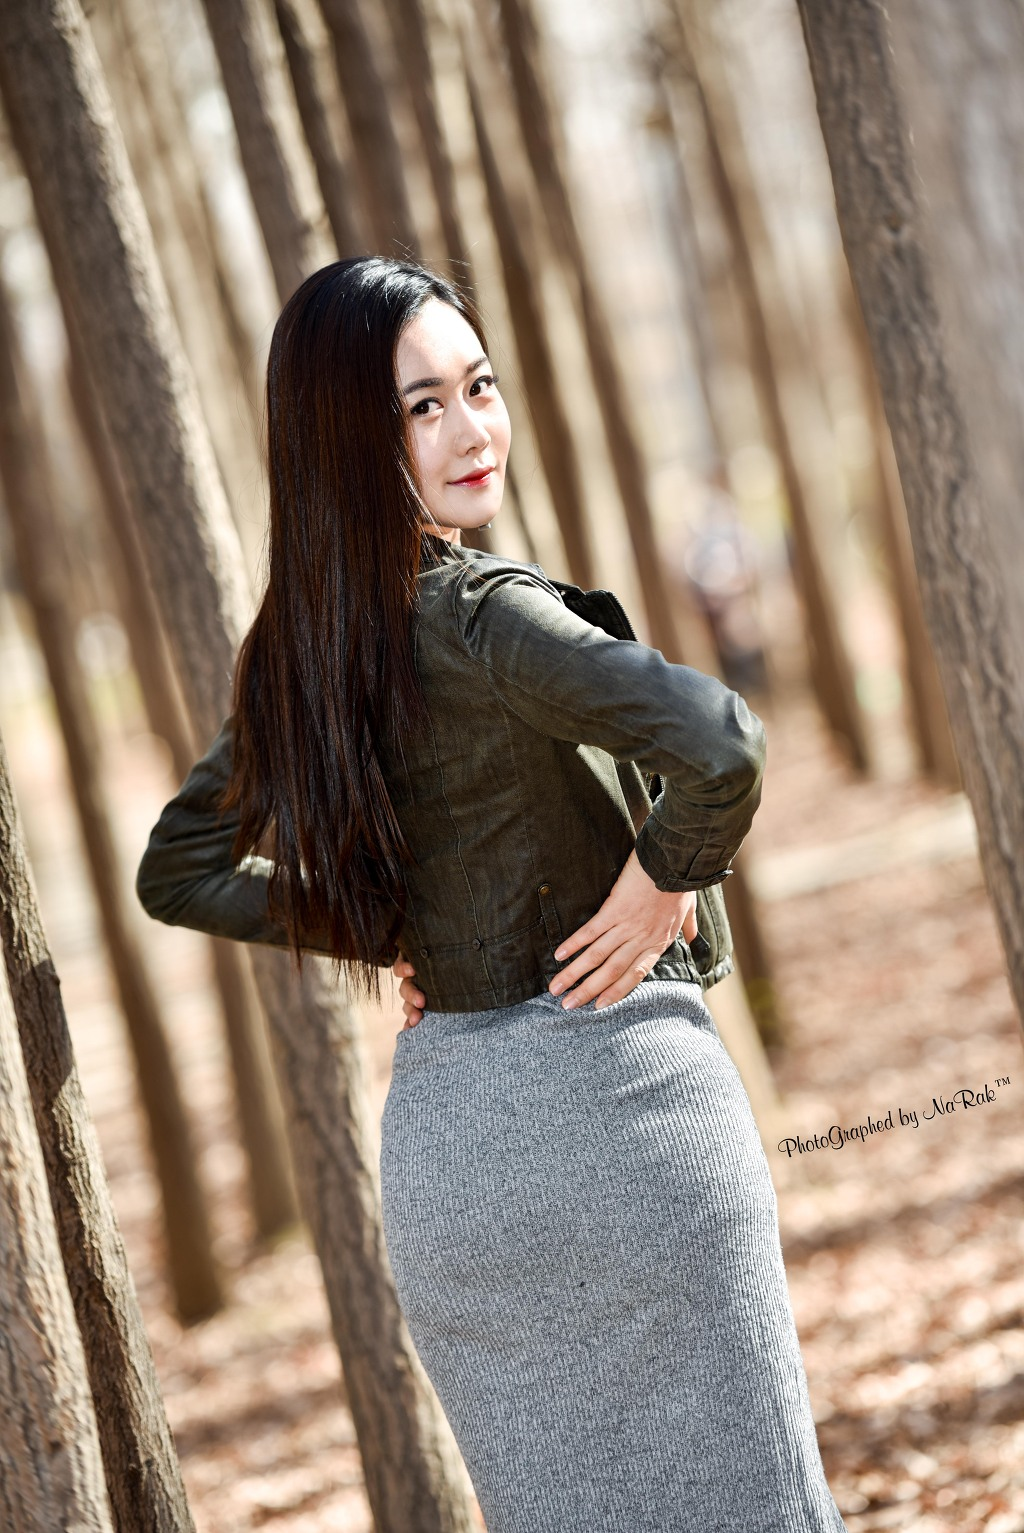 New porn Korean adult film stars